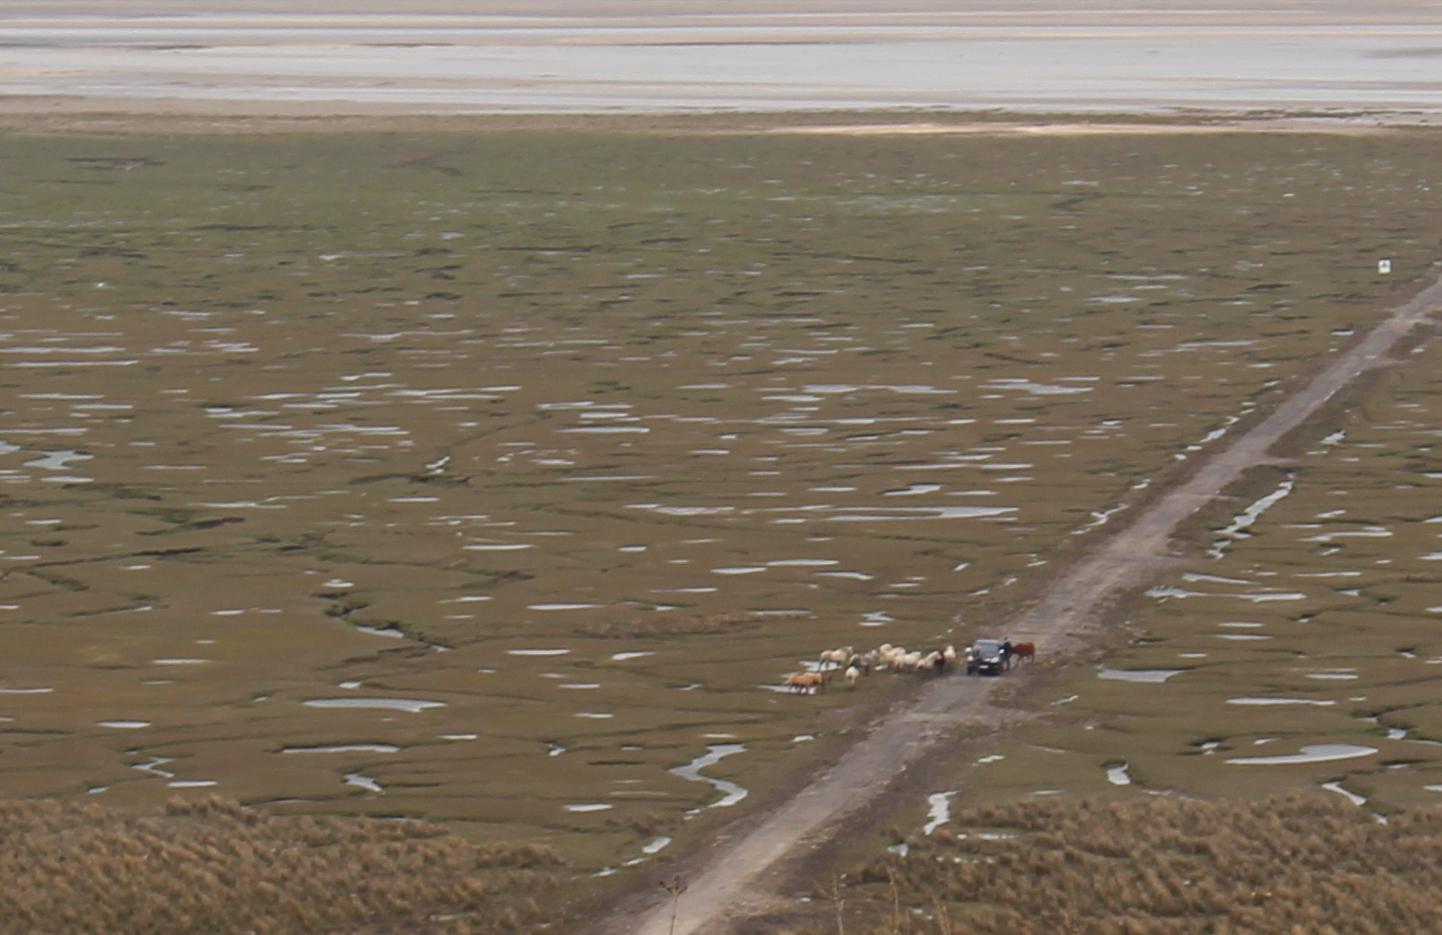 Wales road trip - Welsh salt marshes